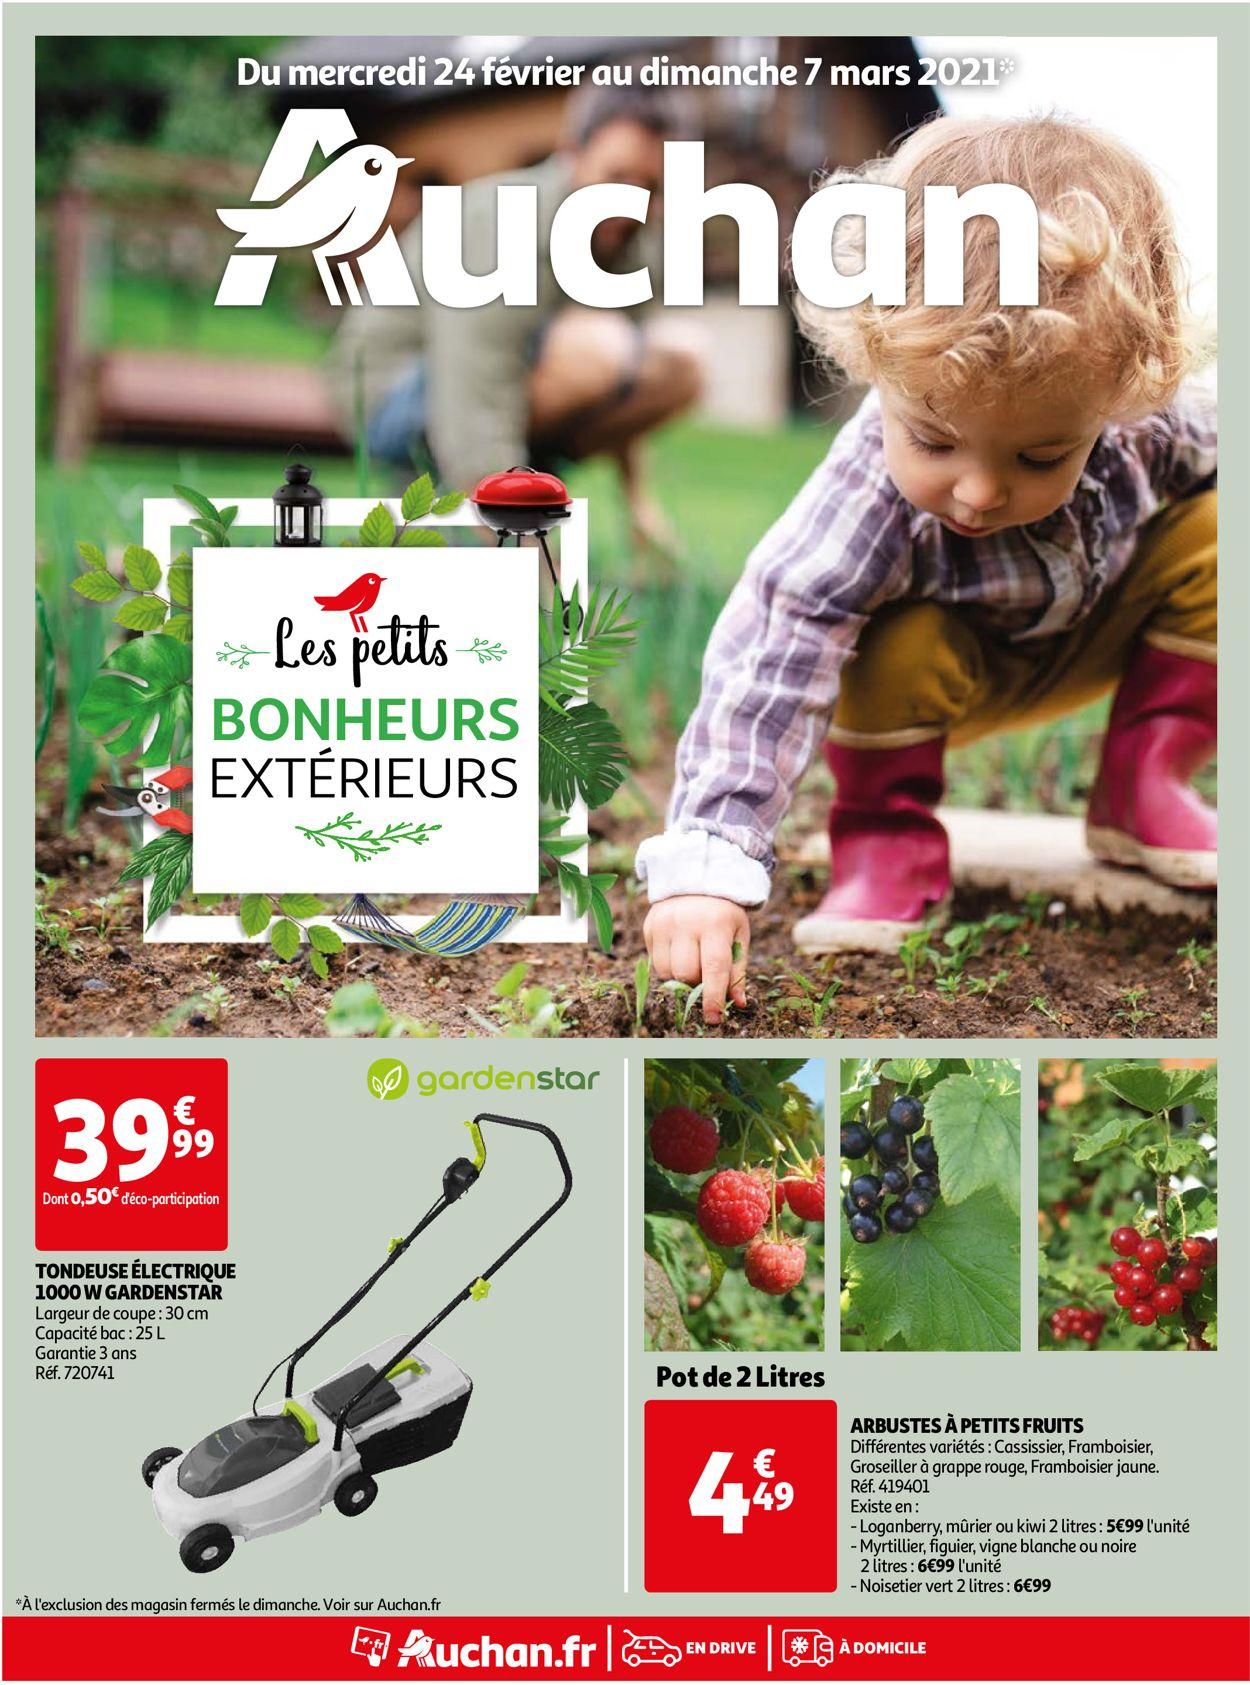 Auchan Catalogue - 24.02-07.03.2021